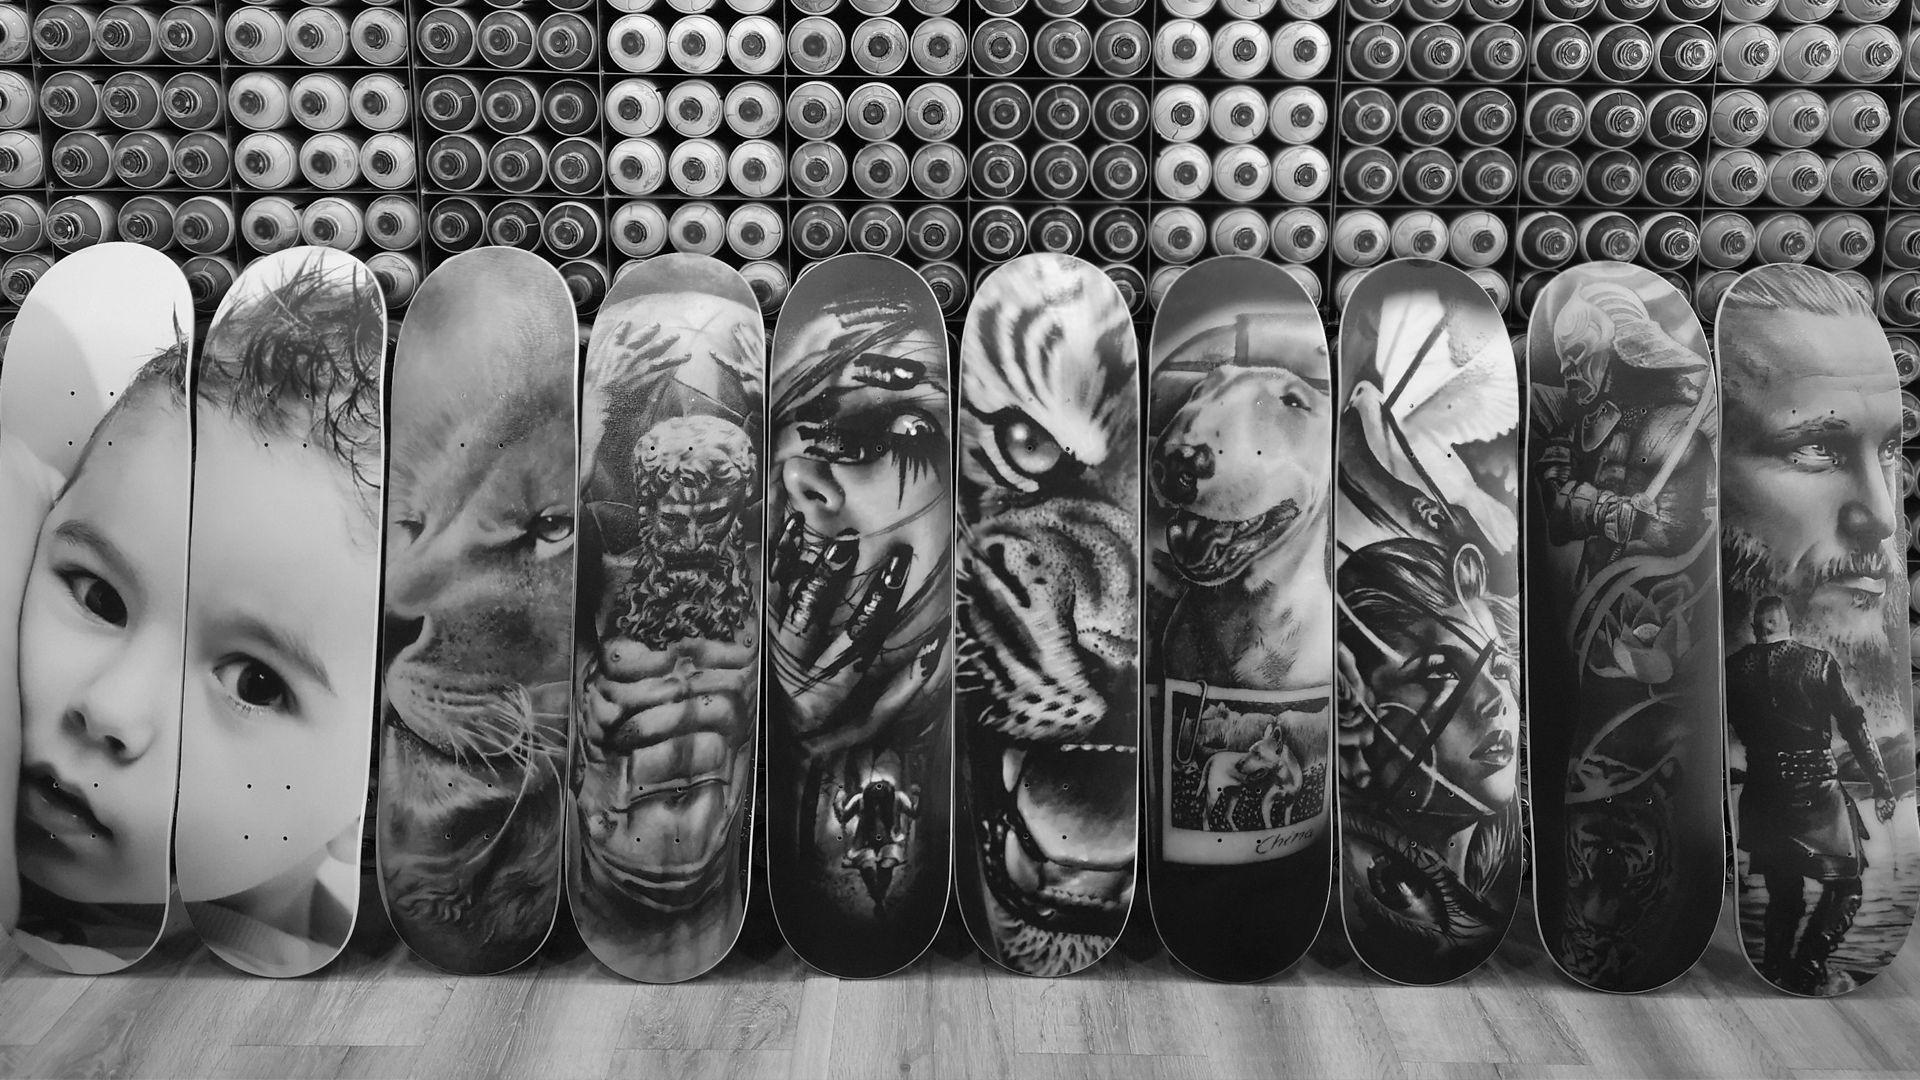 Centro de tatuajes en Tenerife